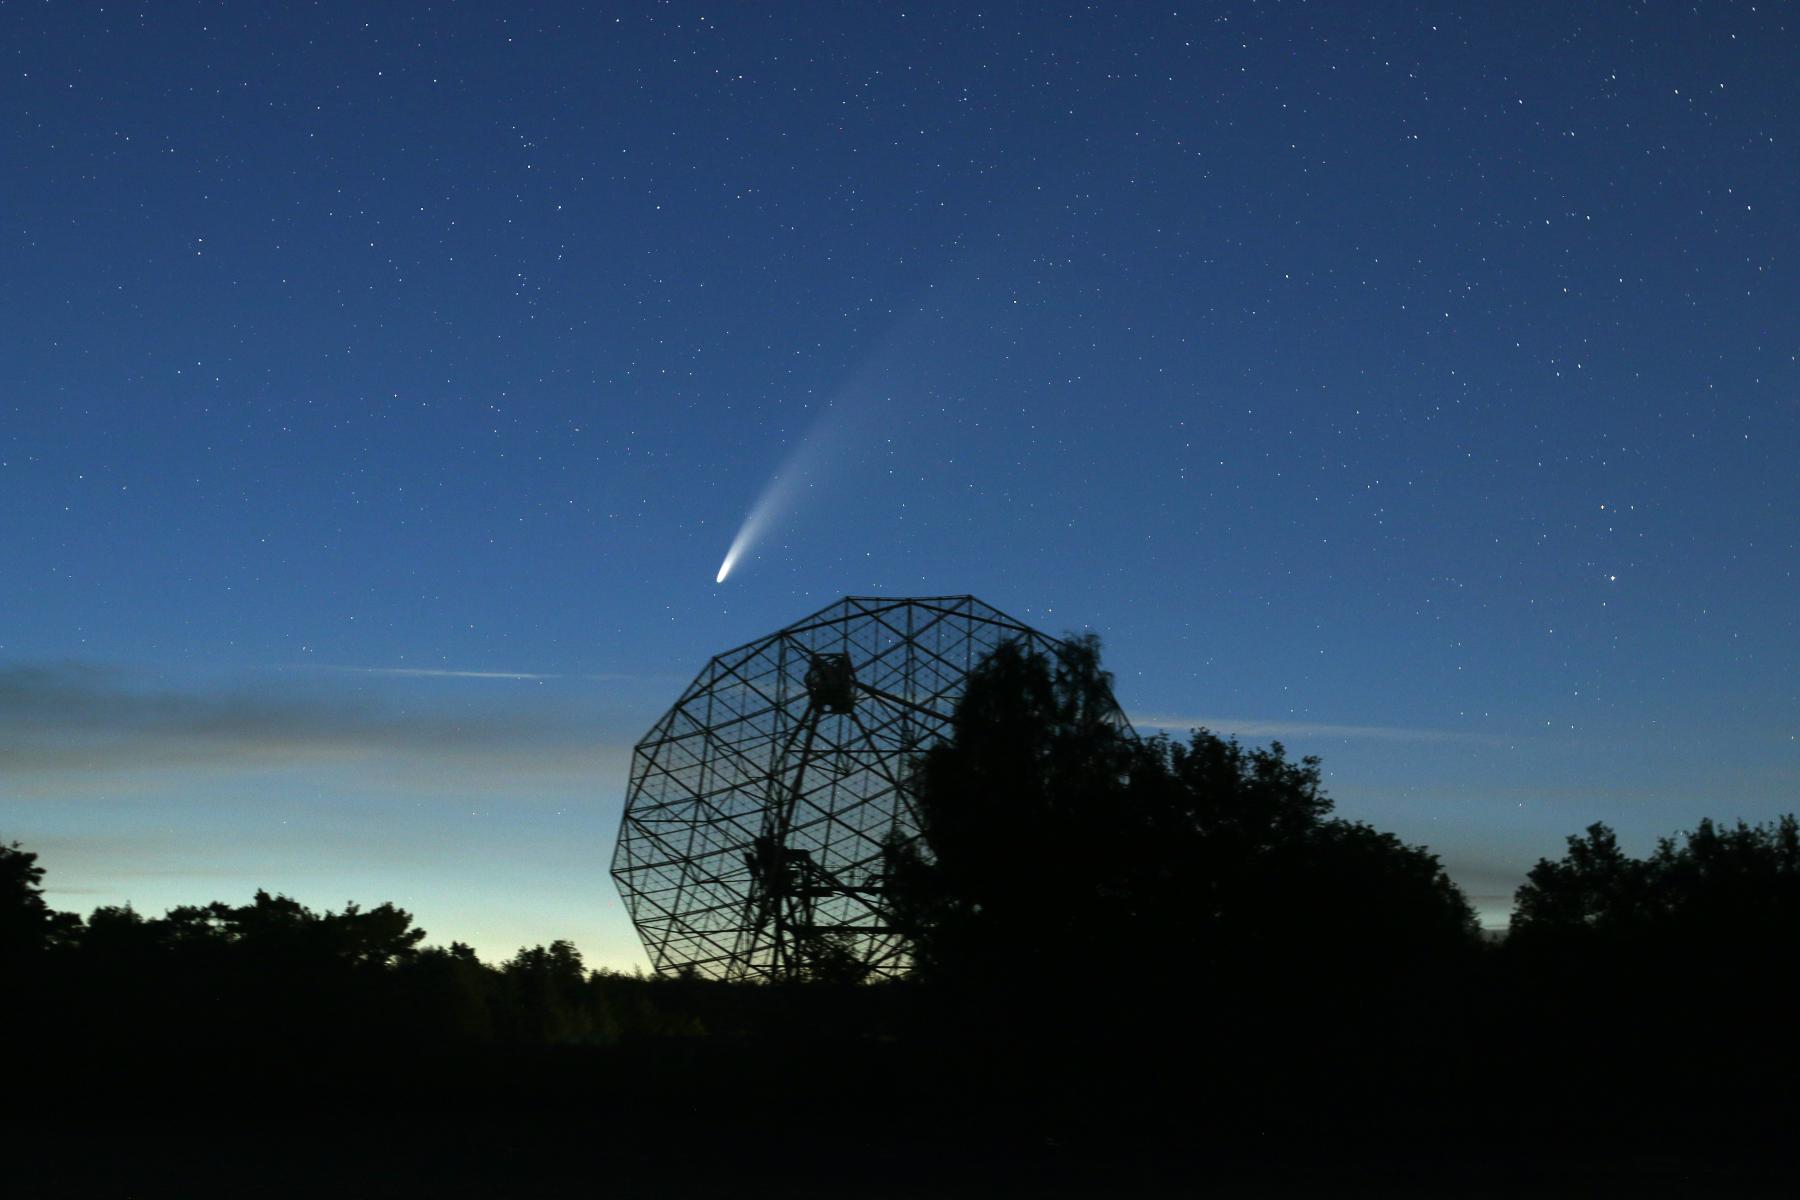 image A bright comet